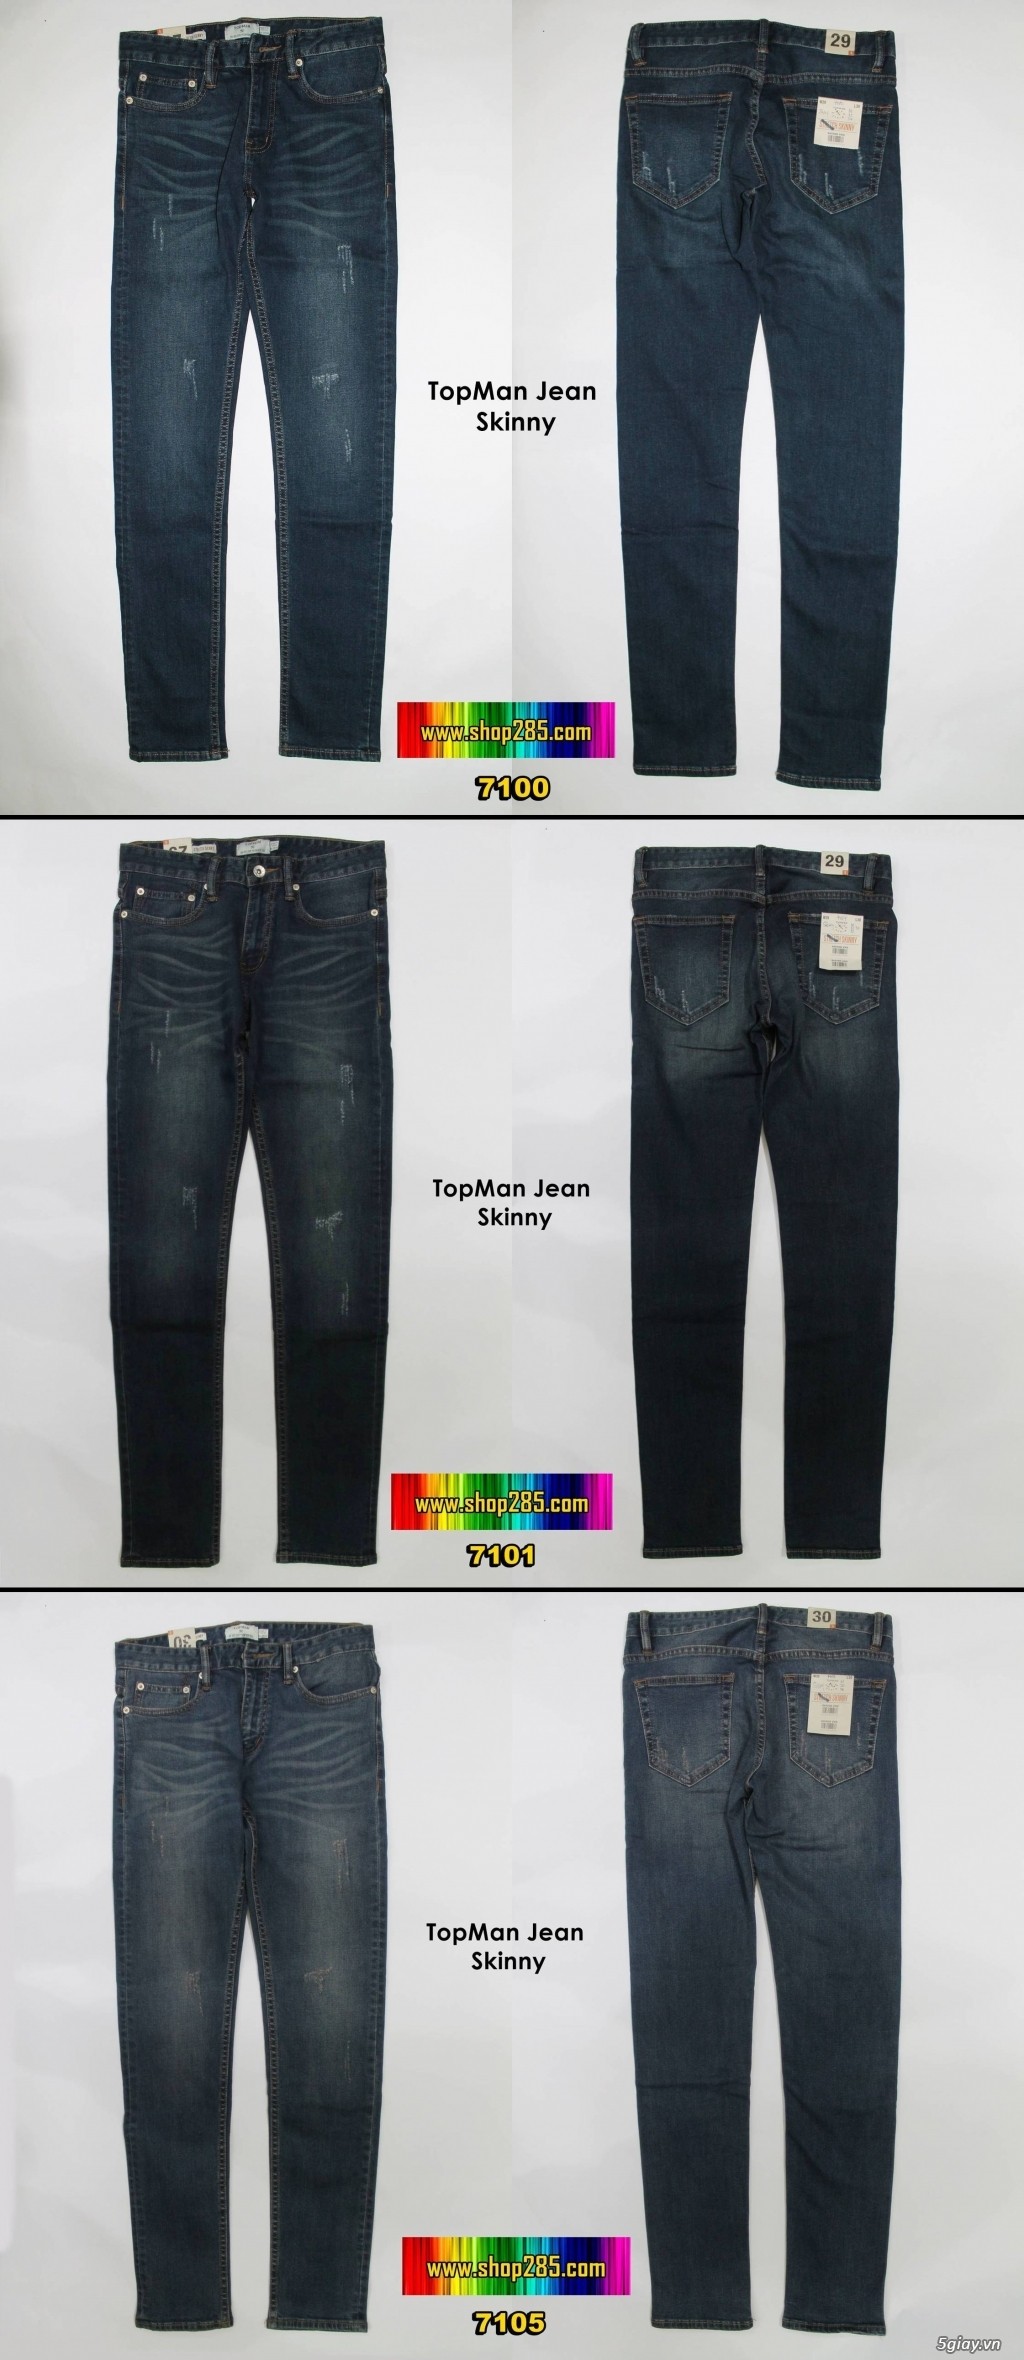 Shop285.com - Shop quần áo : Zara,Jules,Jake*s,,Hollister,Aber,CK,Tommy,Levis - 6